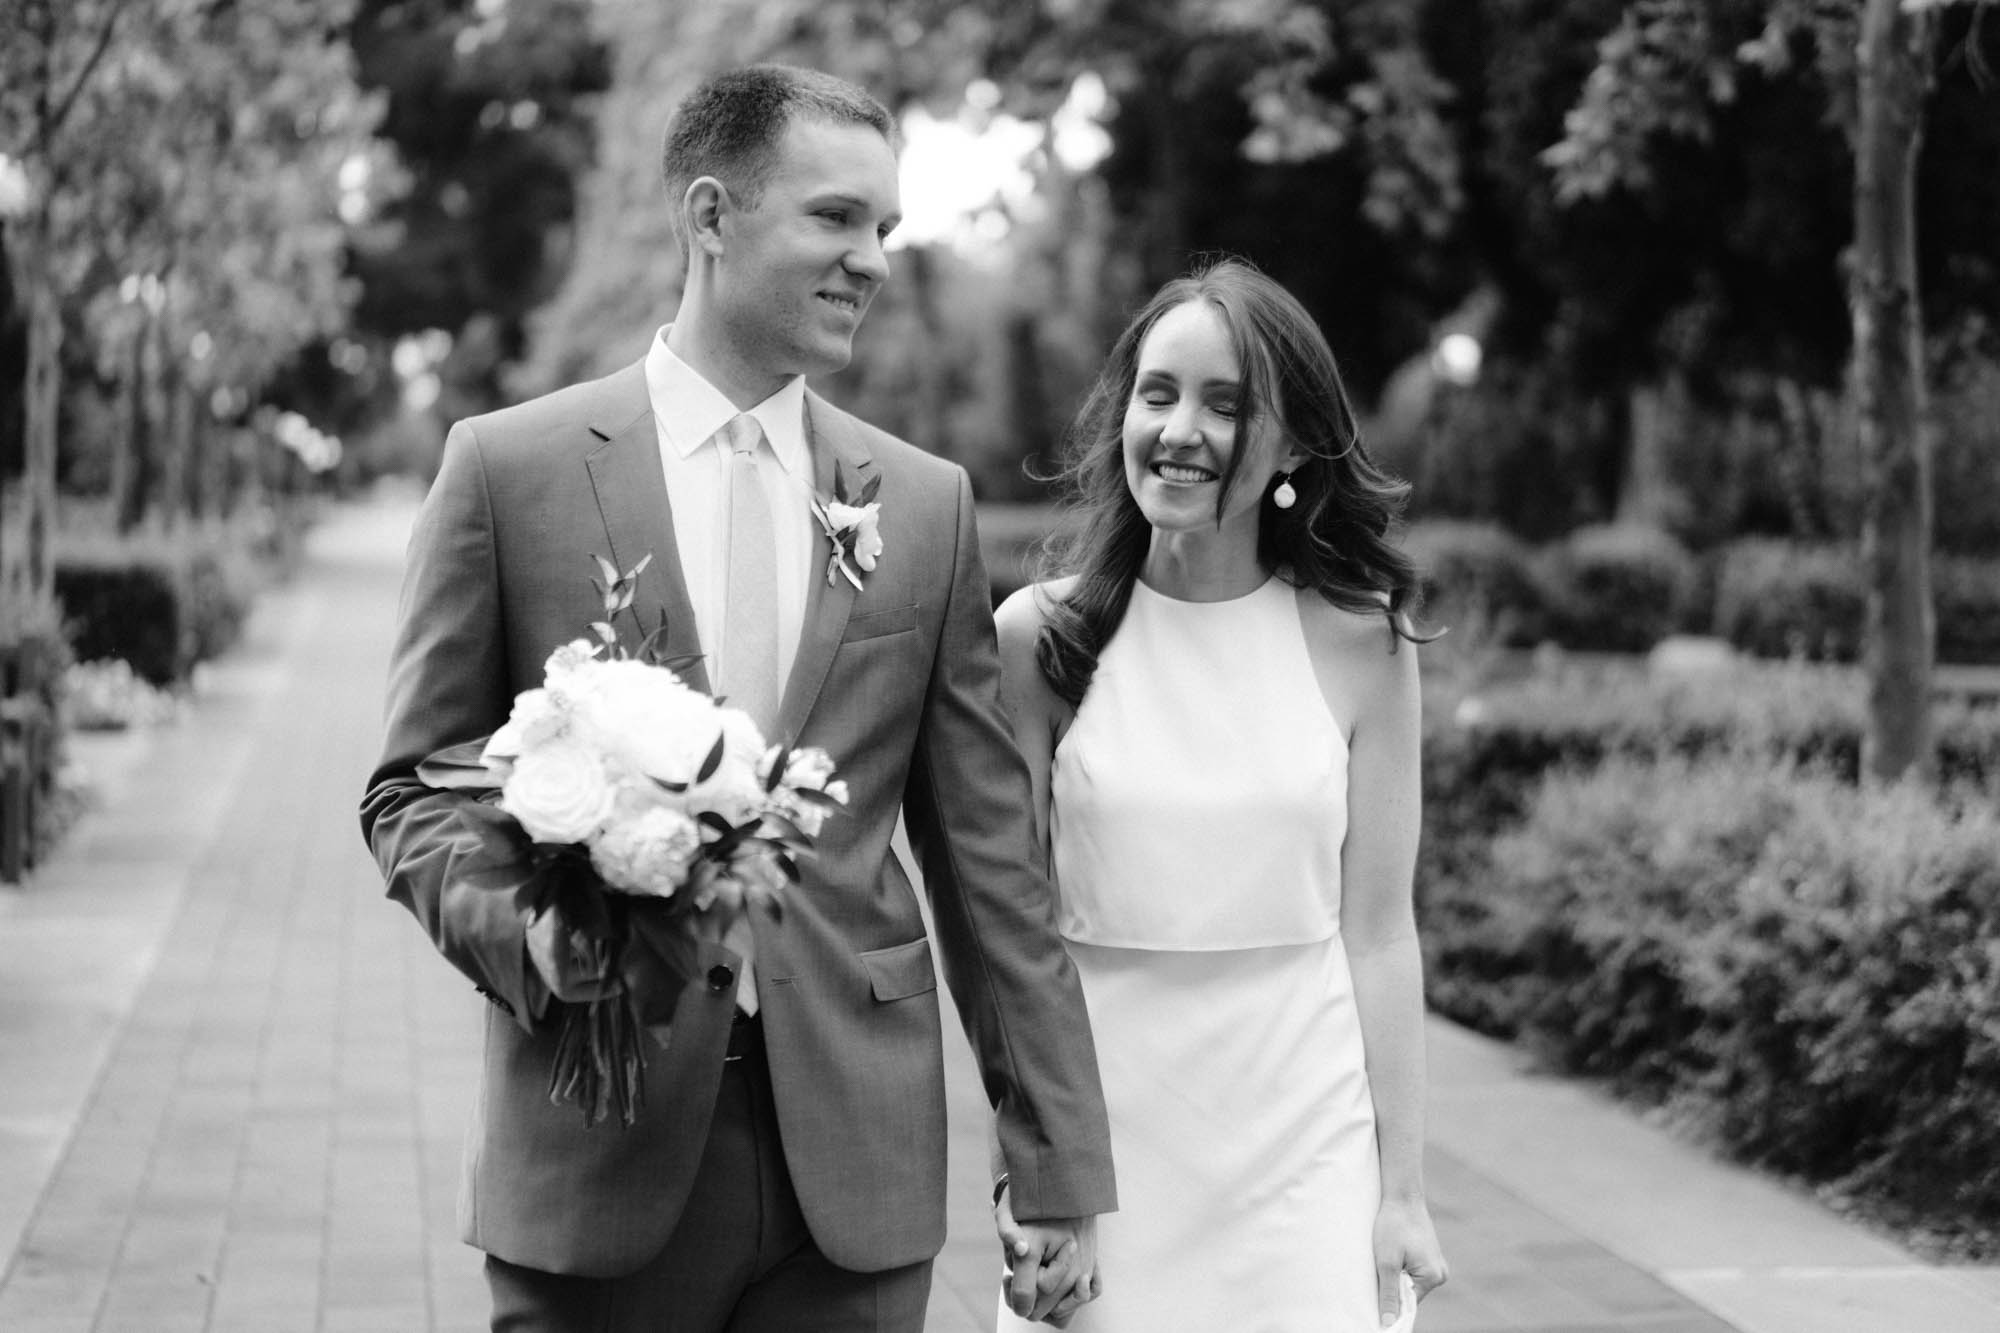 Vina Enoteca Palo Alto Wedding 009.jpg